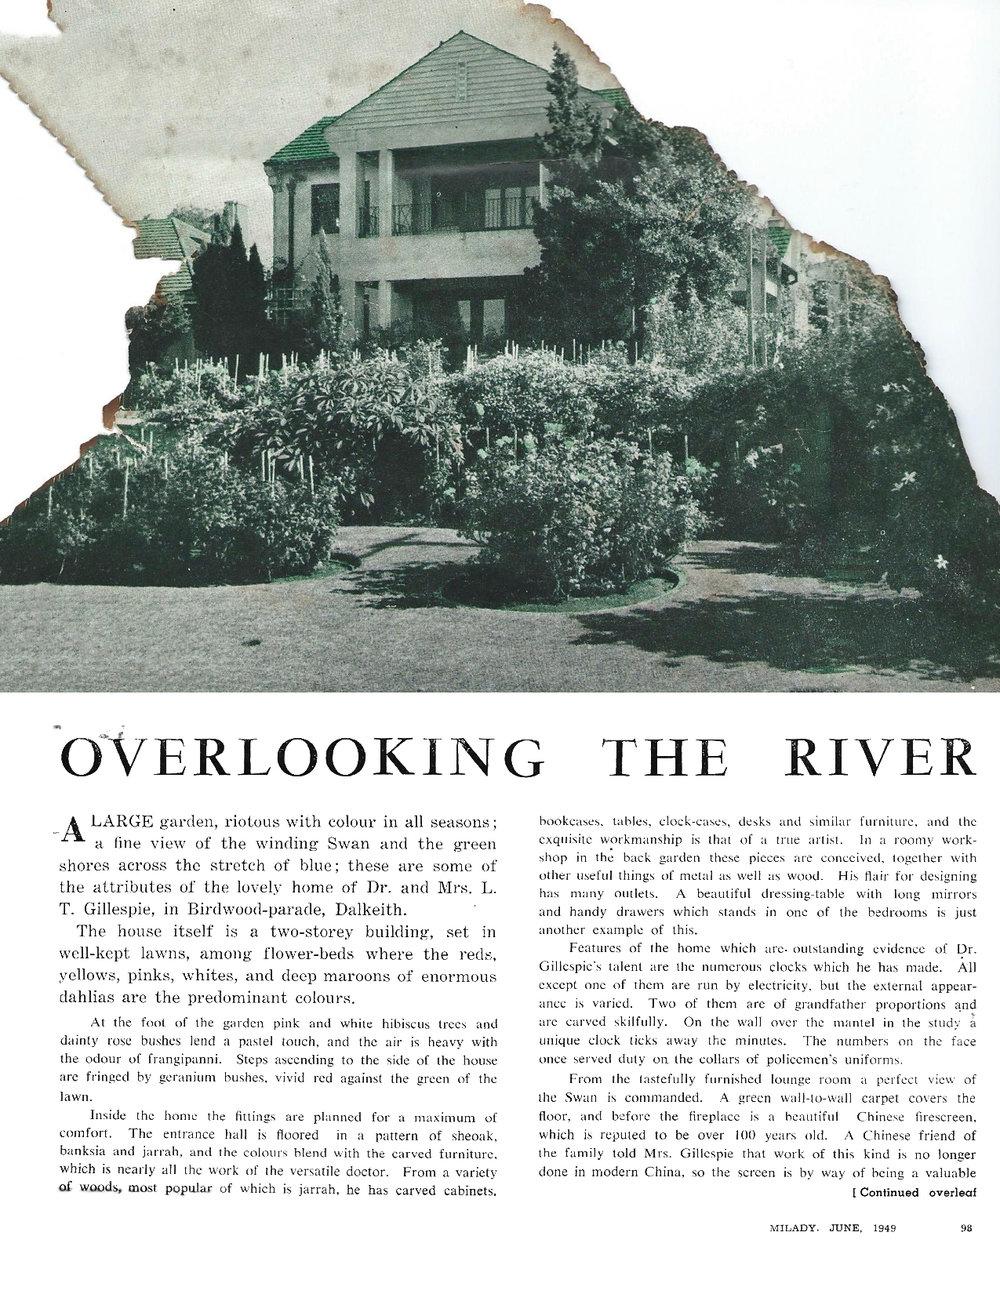 Dr Gillespie's home at 45 Birdwood Parade, Dalkeith, in Milady magazine, June 1949. Courtesy Emeritus Professor Max Kamien.